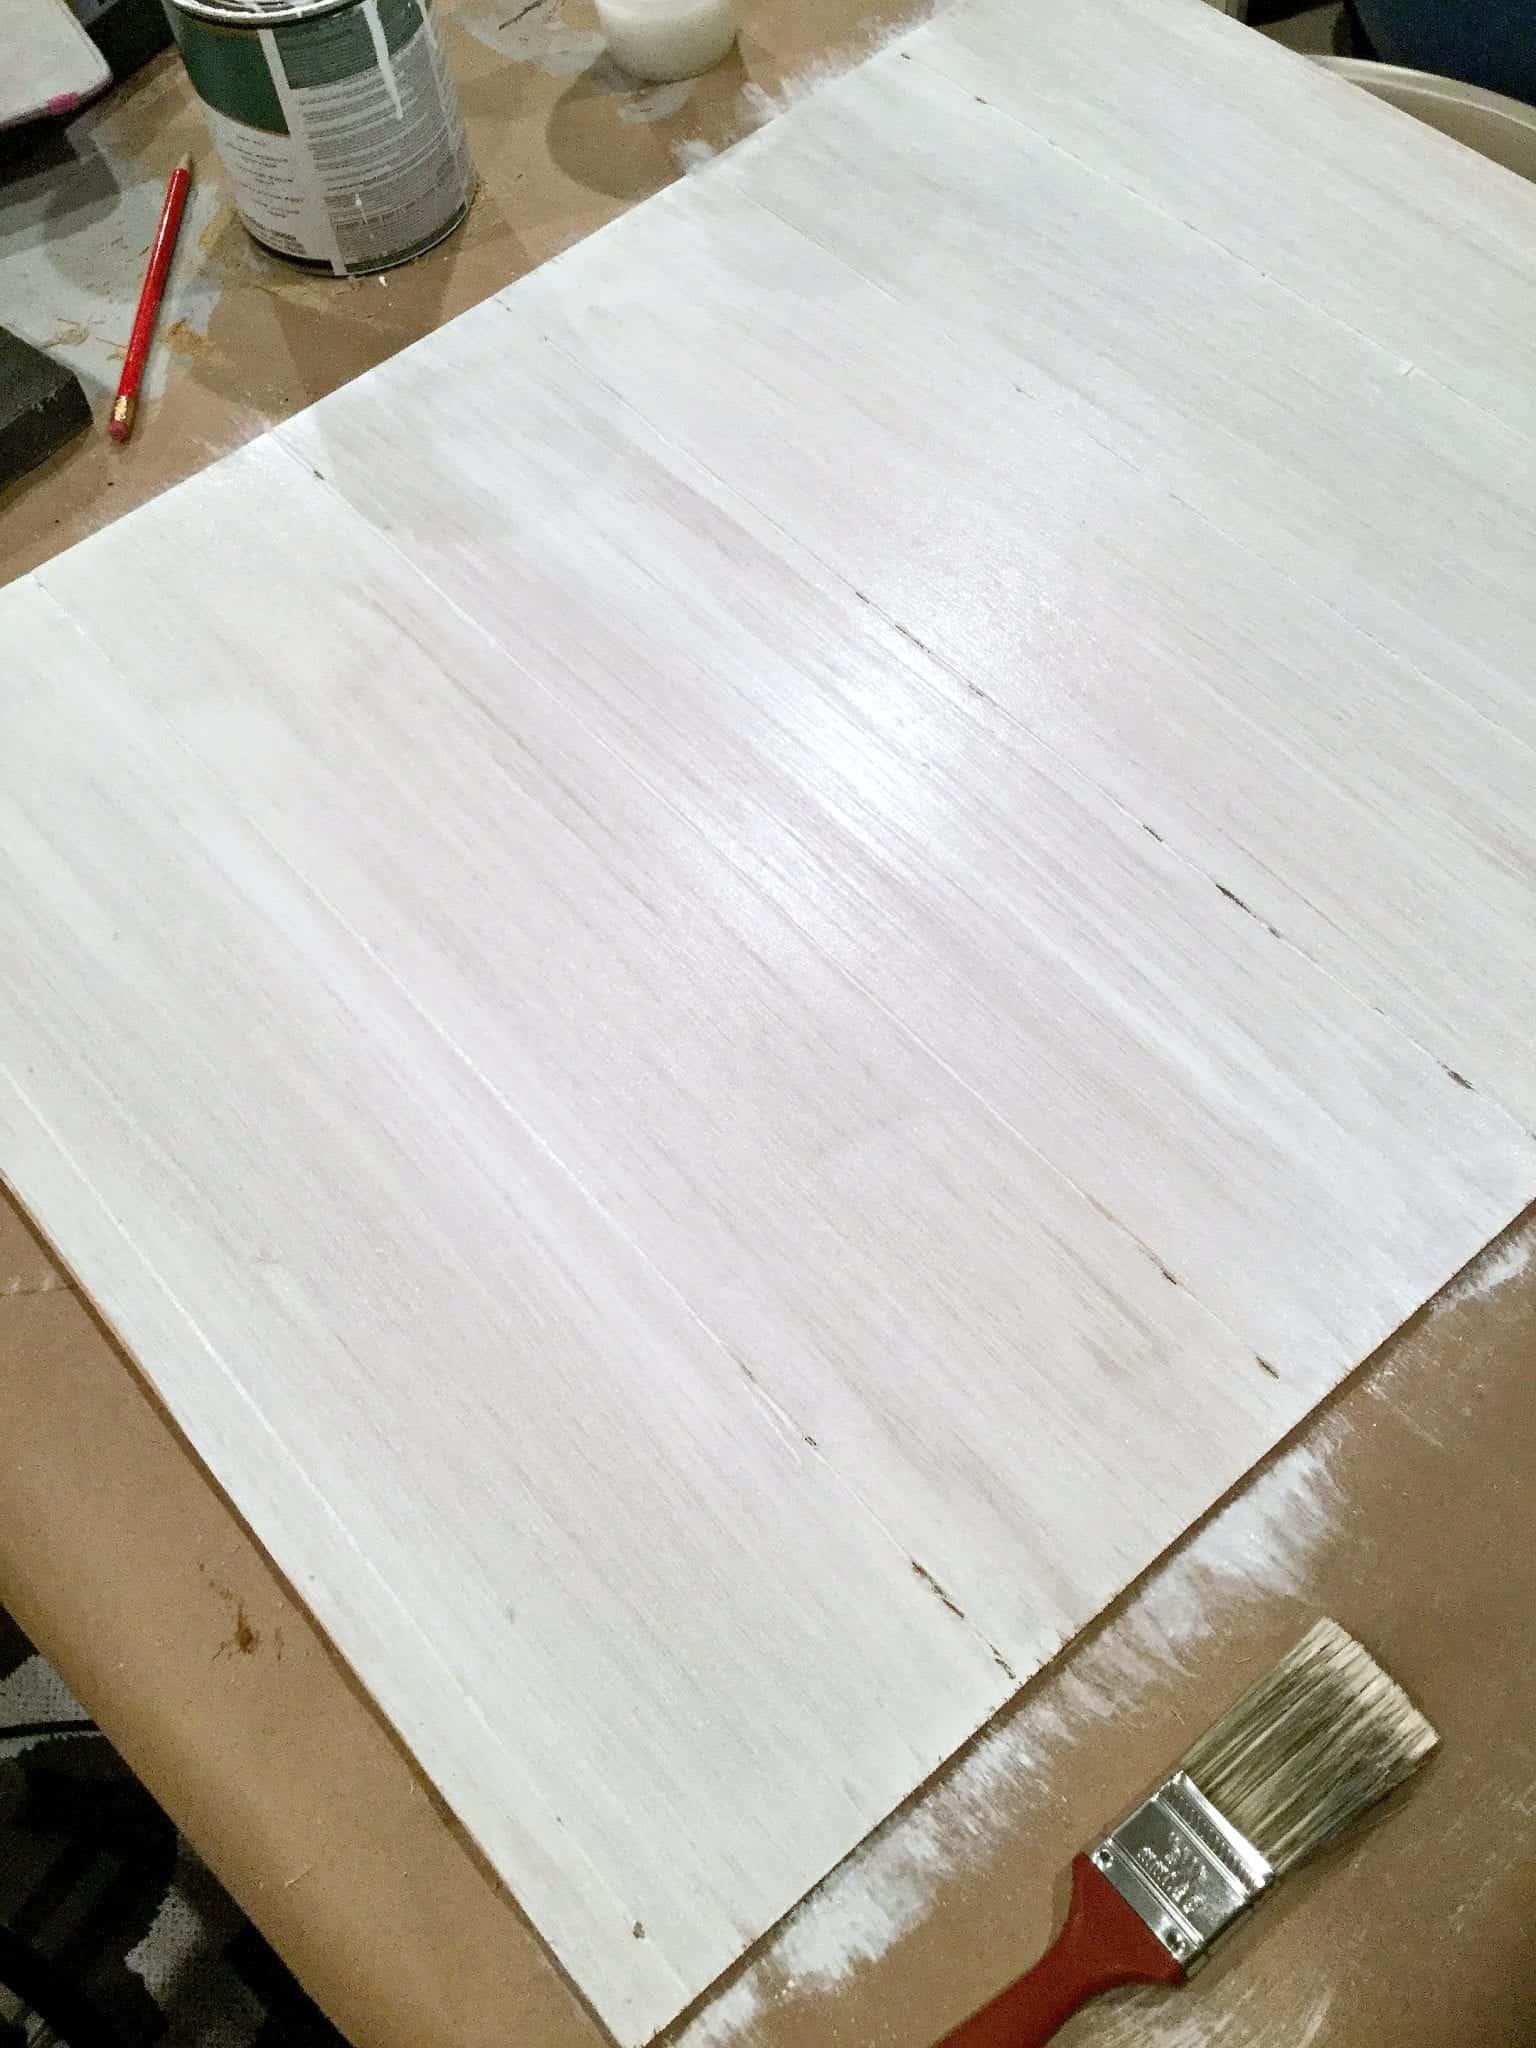 DIY Faux Shiplap Using A Dremel Tool-Apply a Whitewash Paint Effect